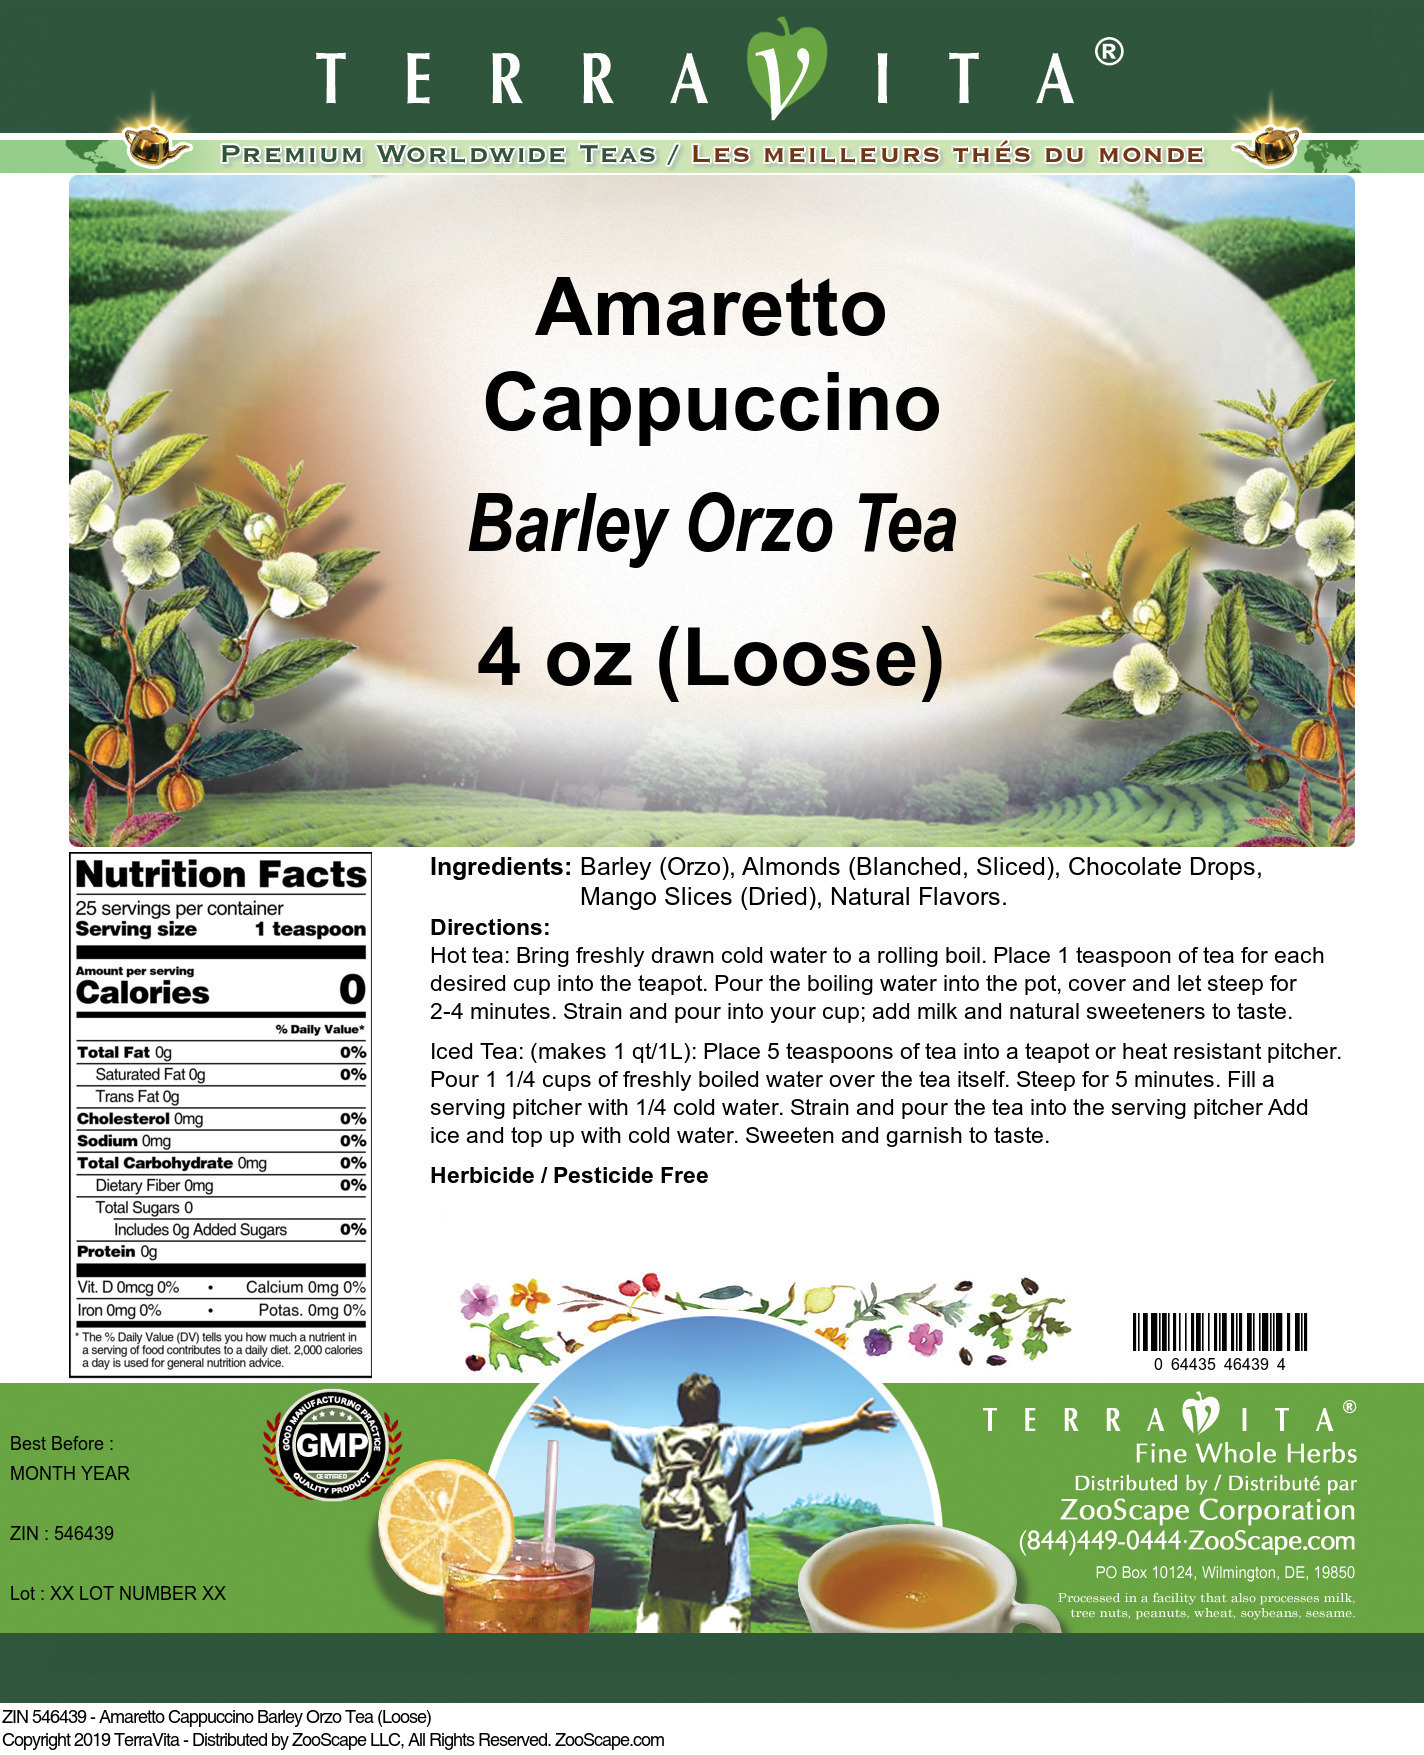 Amaretto Cappuccino Barley Orzo Tea (Loose)